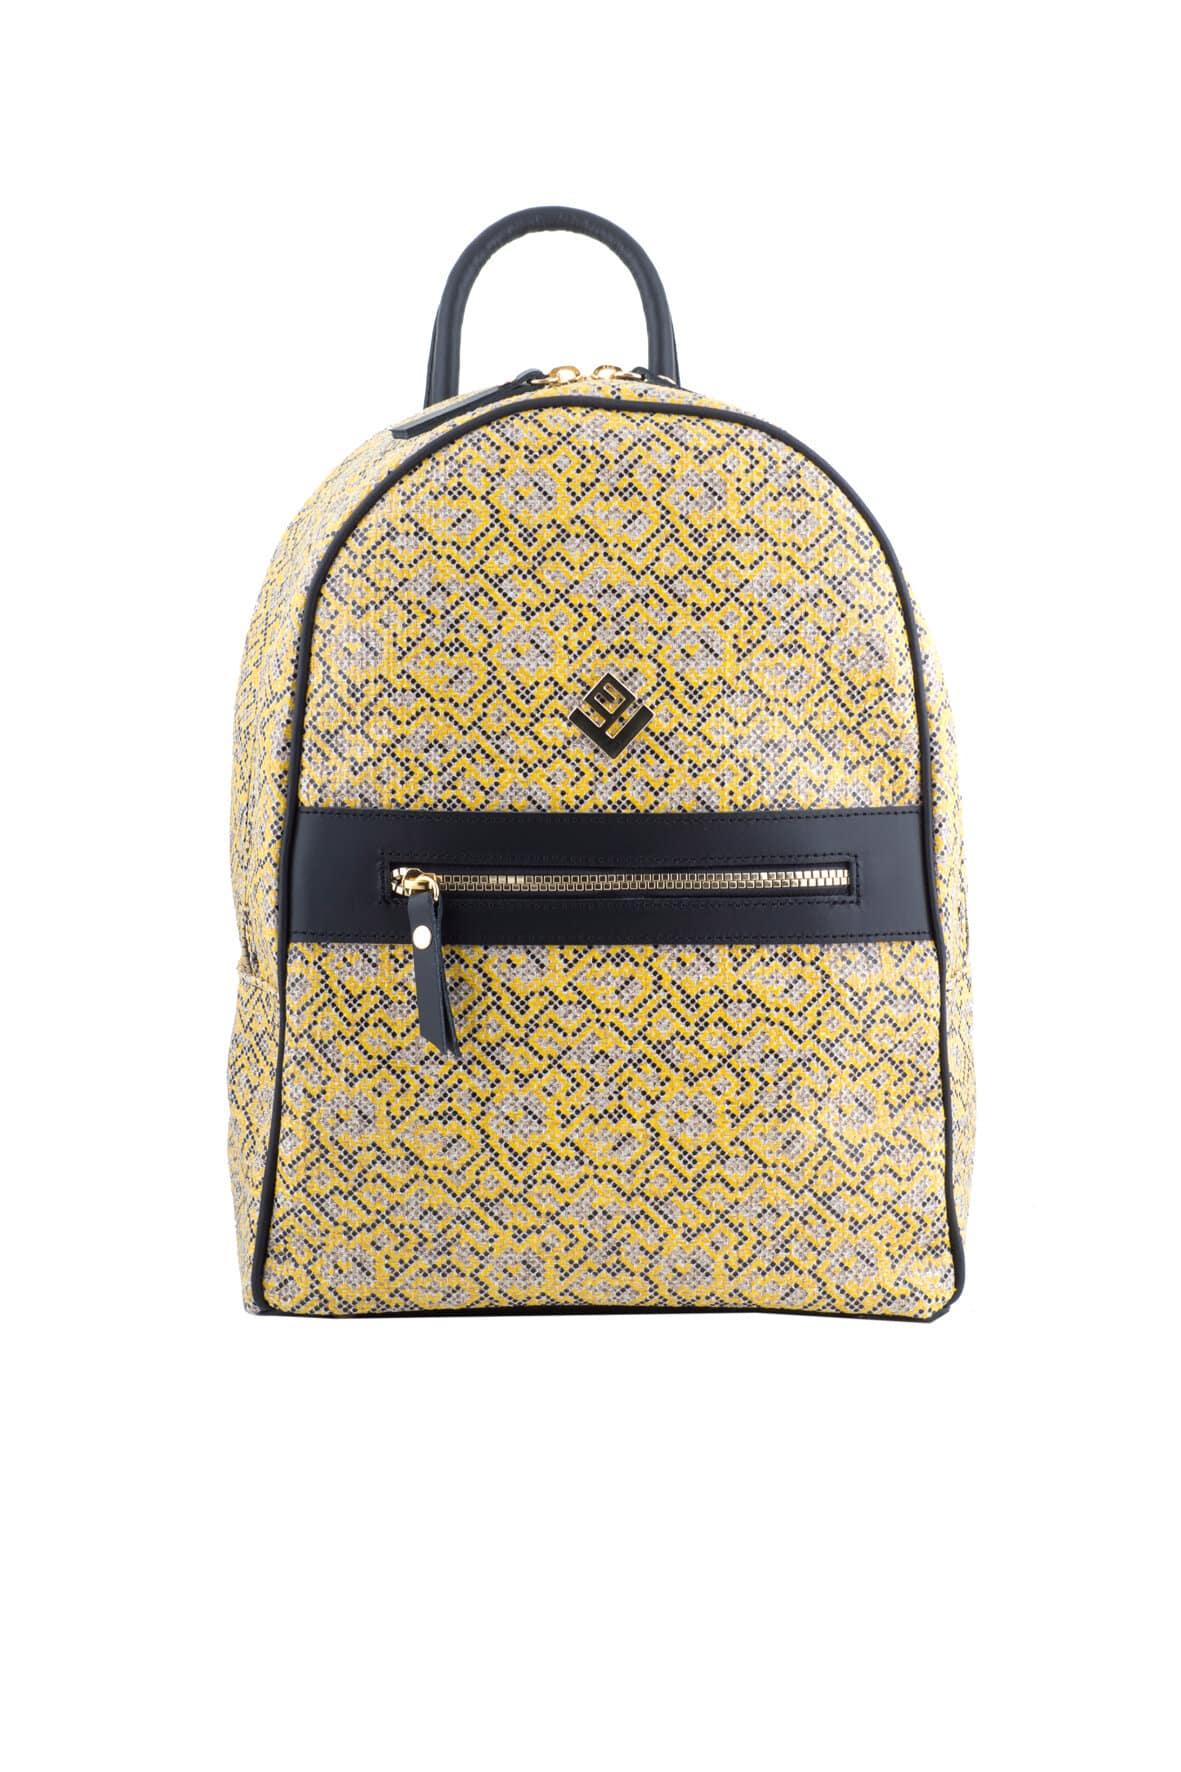 Basic Stitch Backpack Yellow